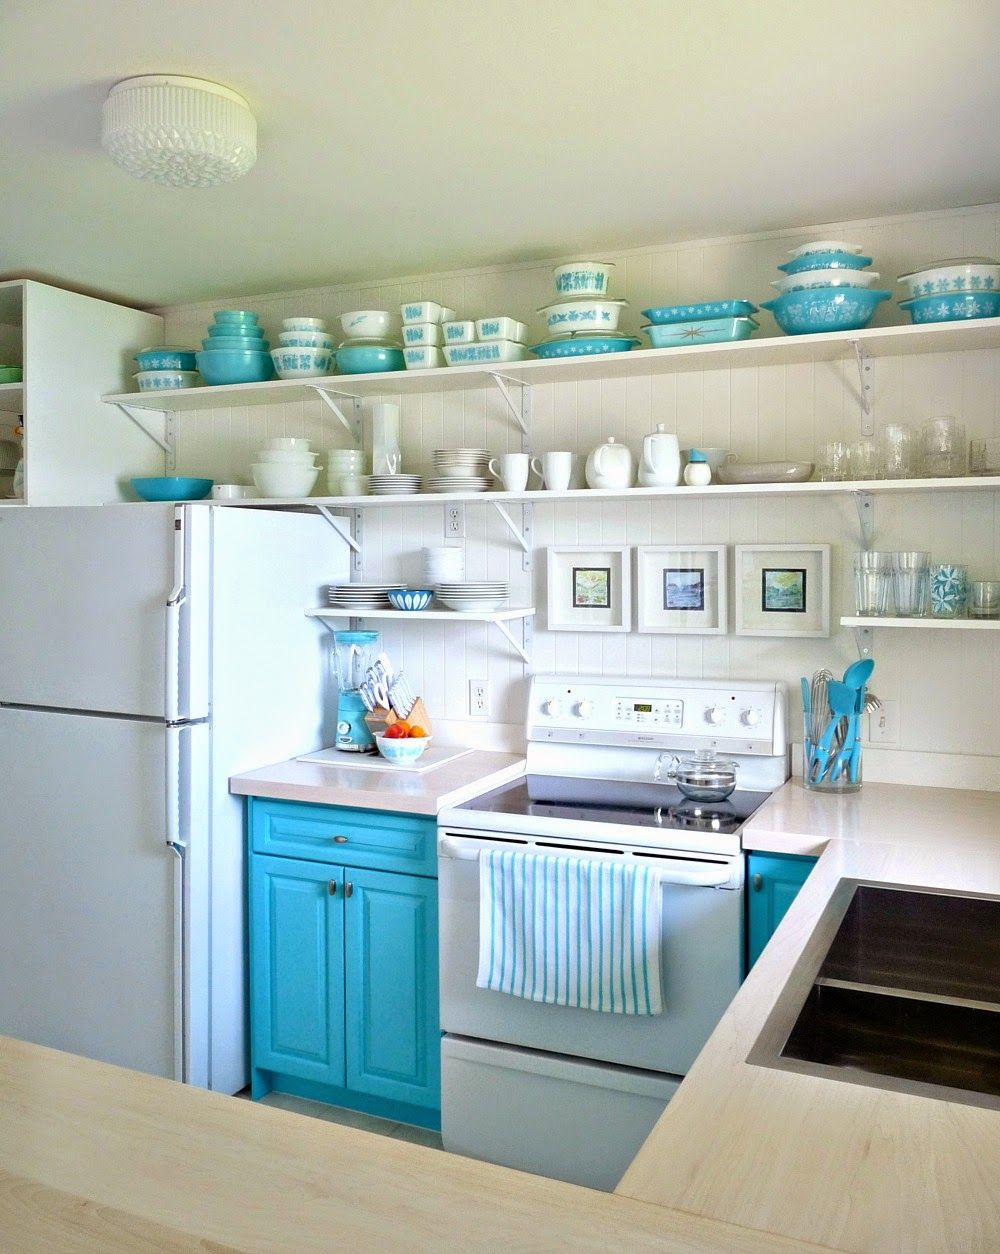 Diy Faux Flower Clutch Makeover Basement Kitchen Aqua Kitchen Turquoise Kitchen